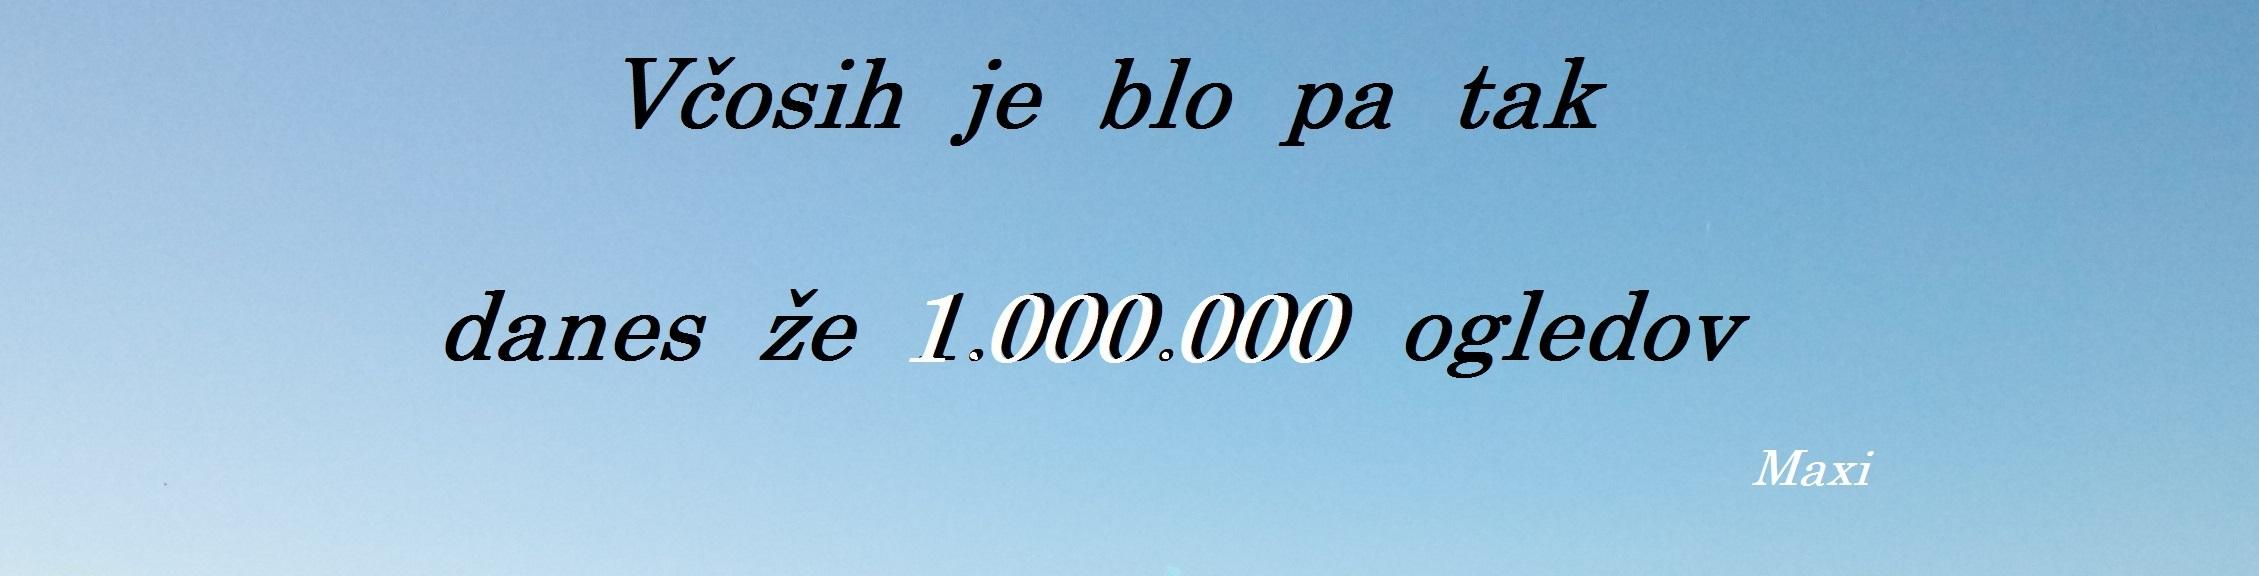 http://shramba.lovrenc.net/maxi/klepet/olo.jpg